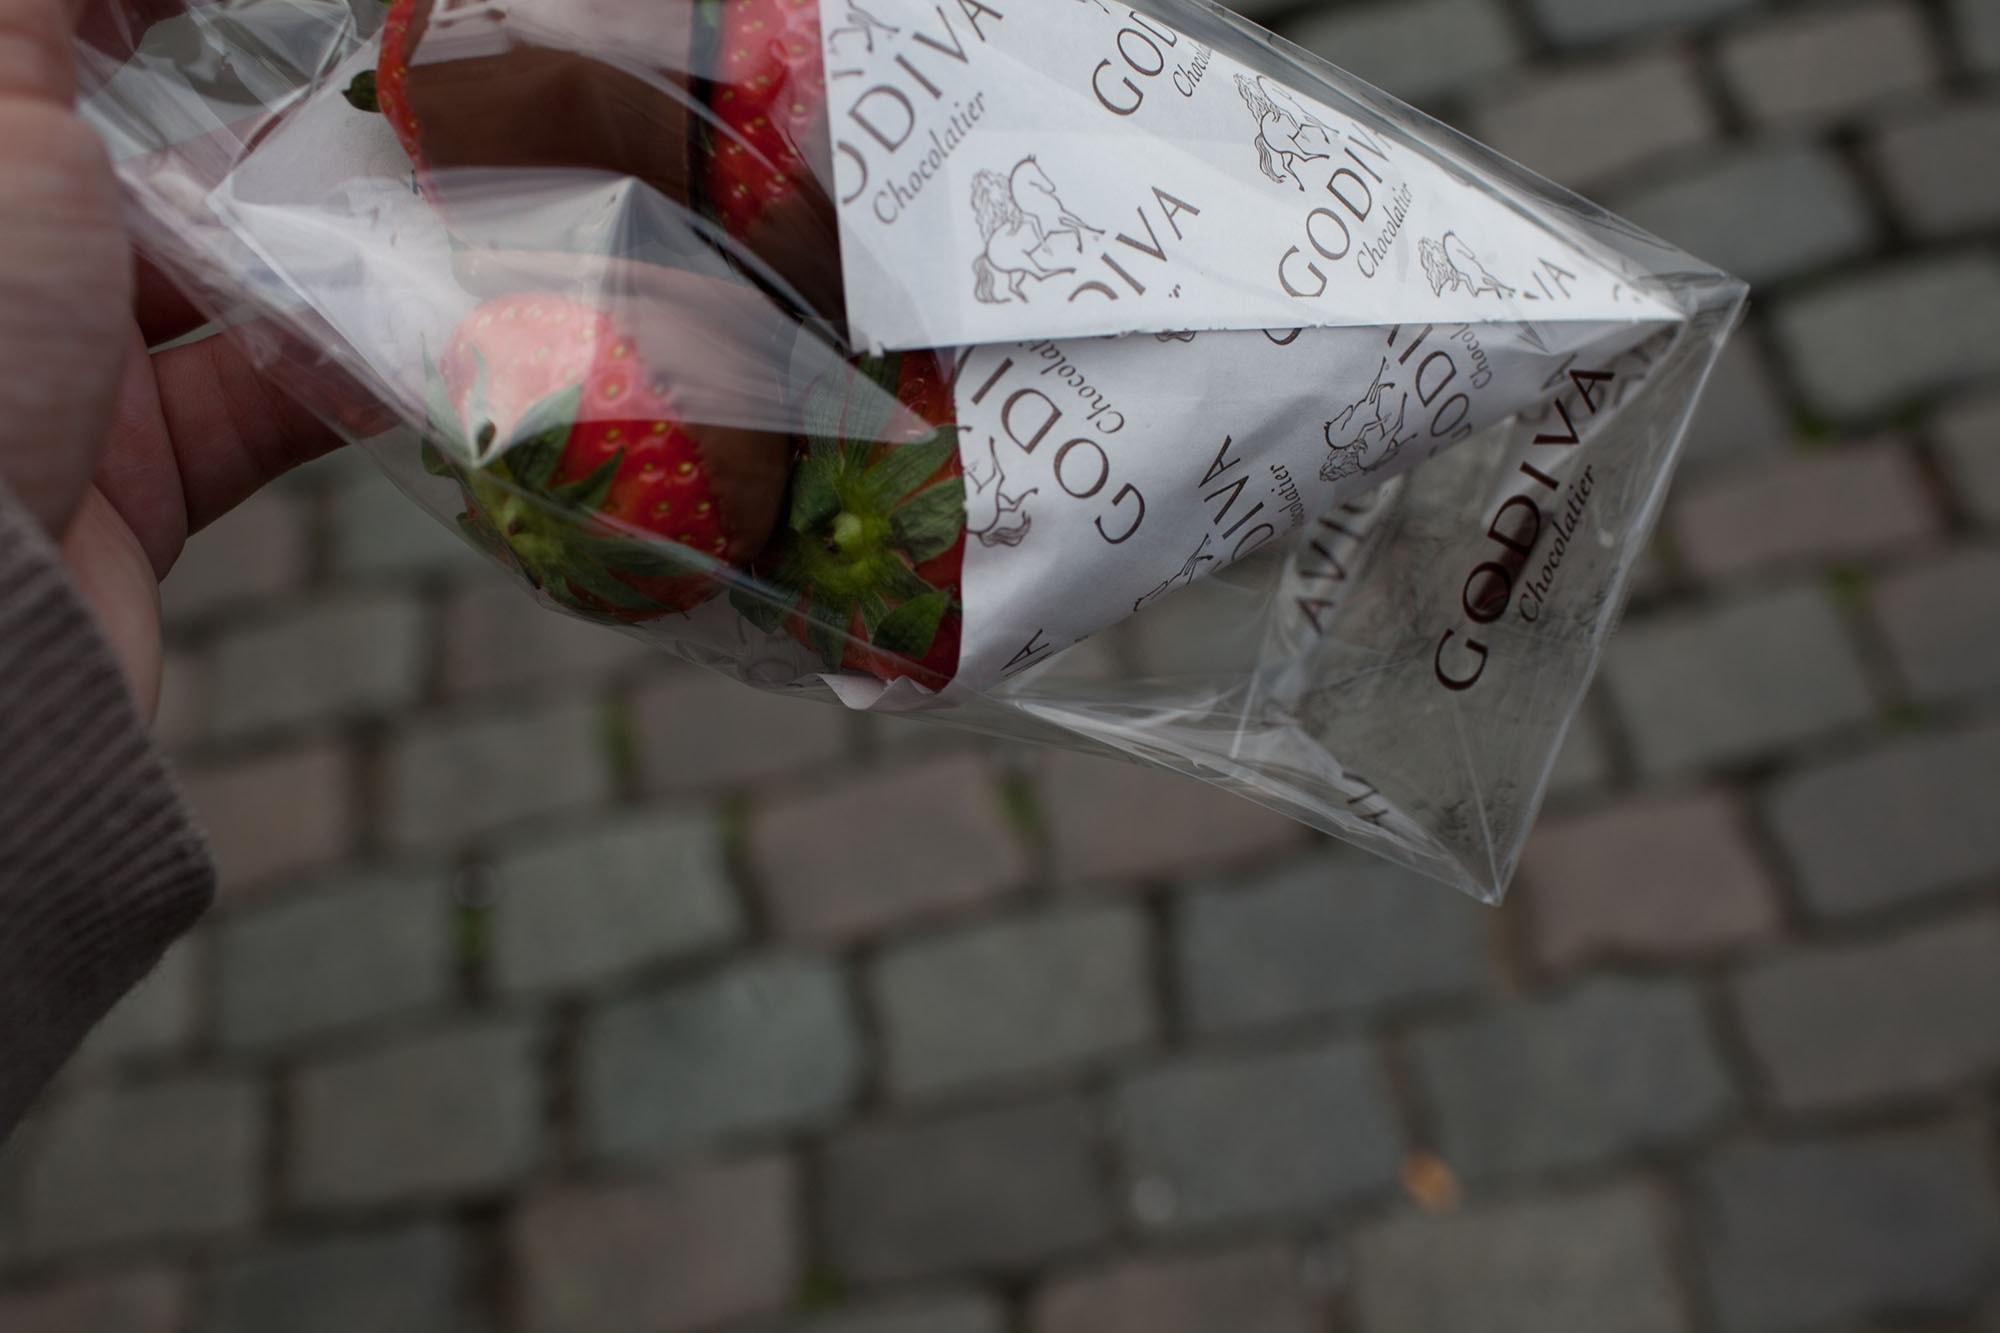 Godiva chocolate covered strawberries in Brussels, Belgium